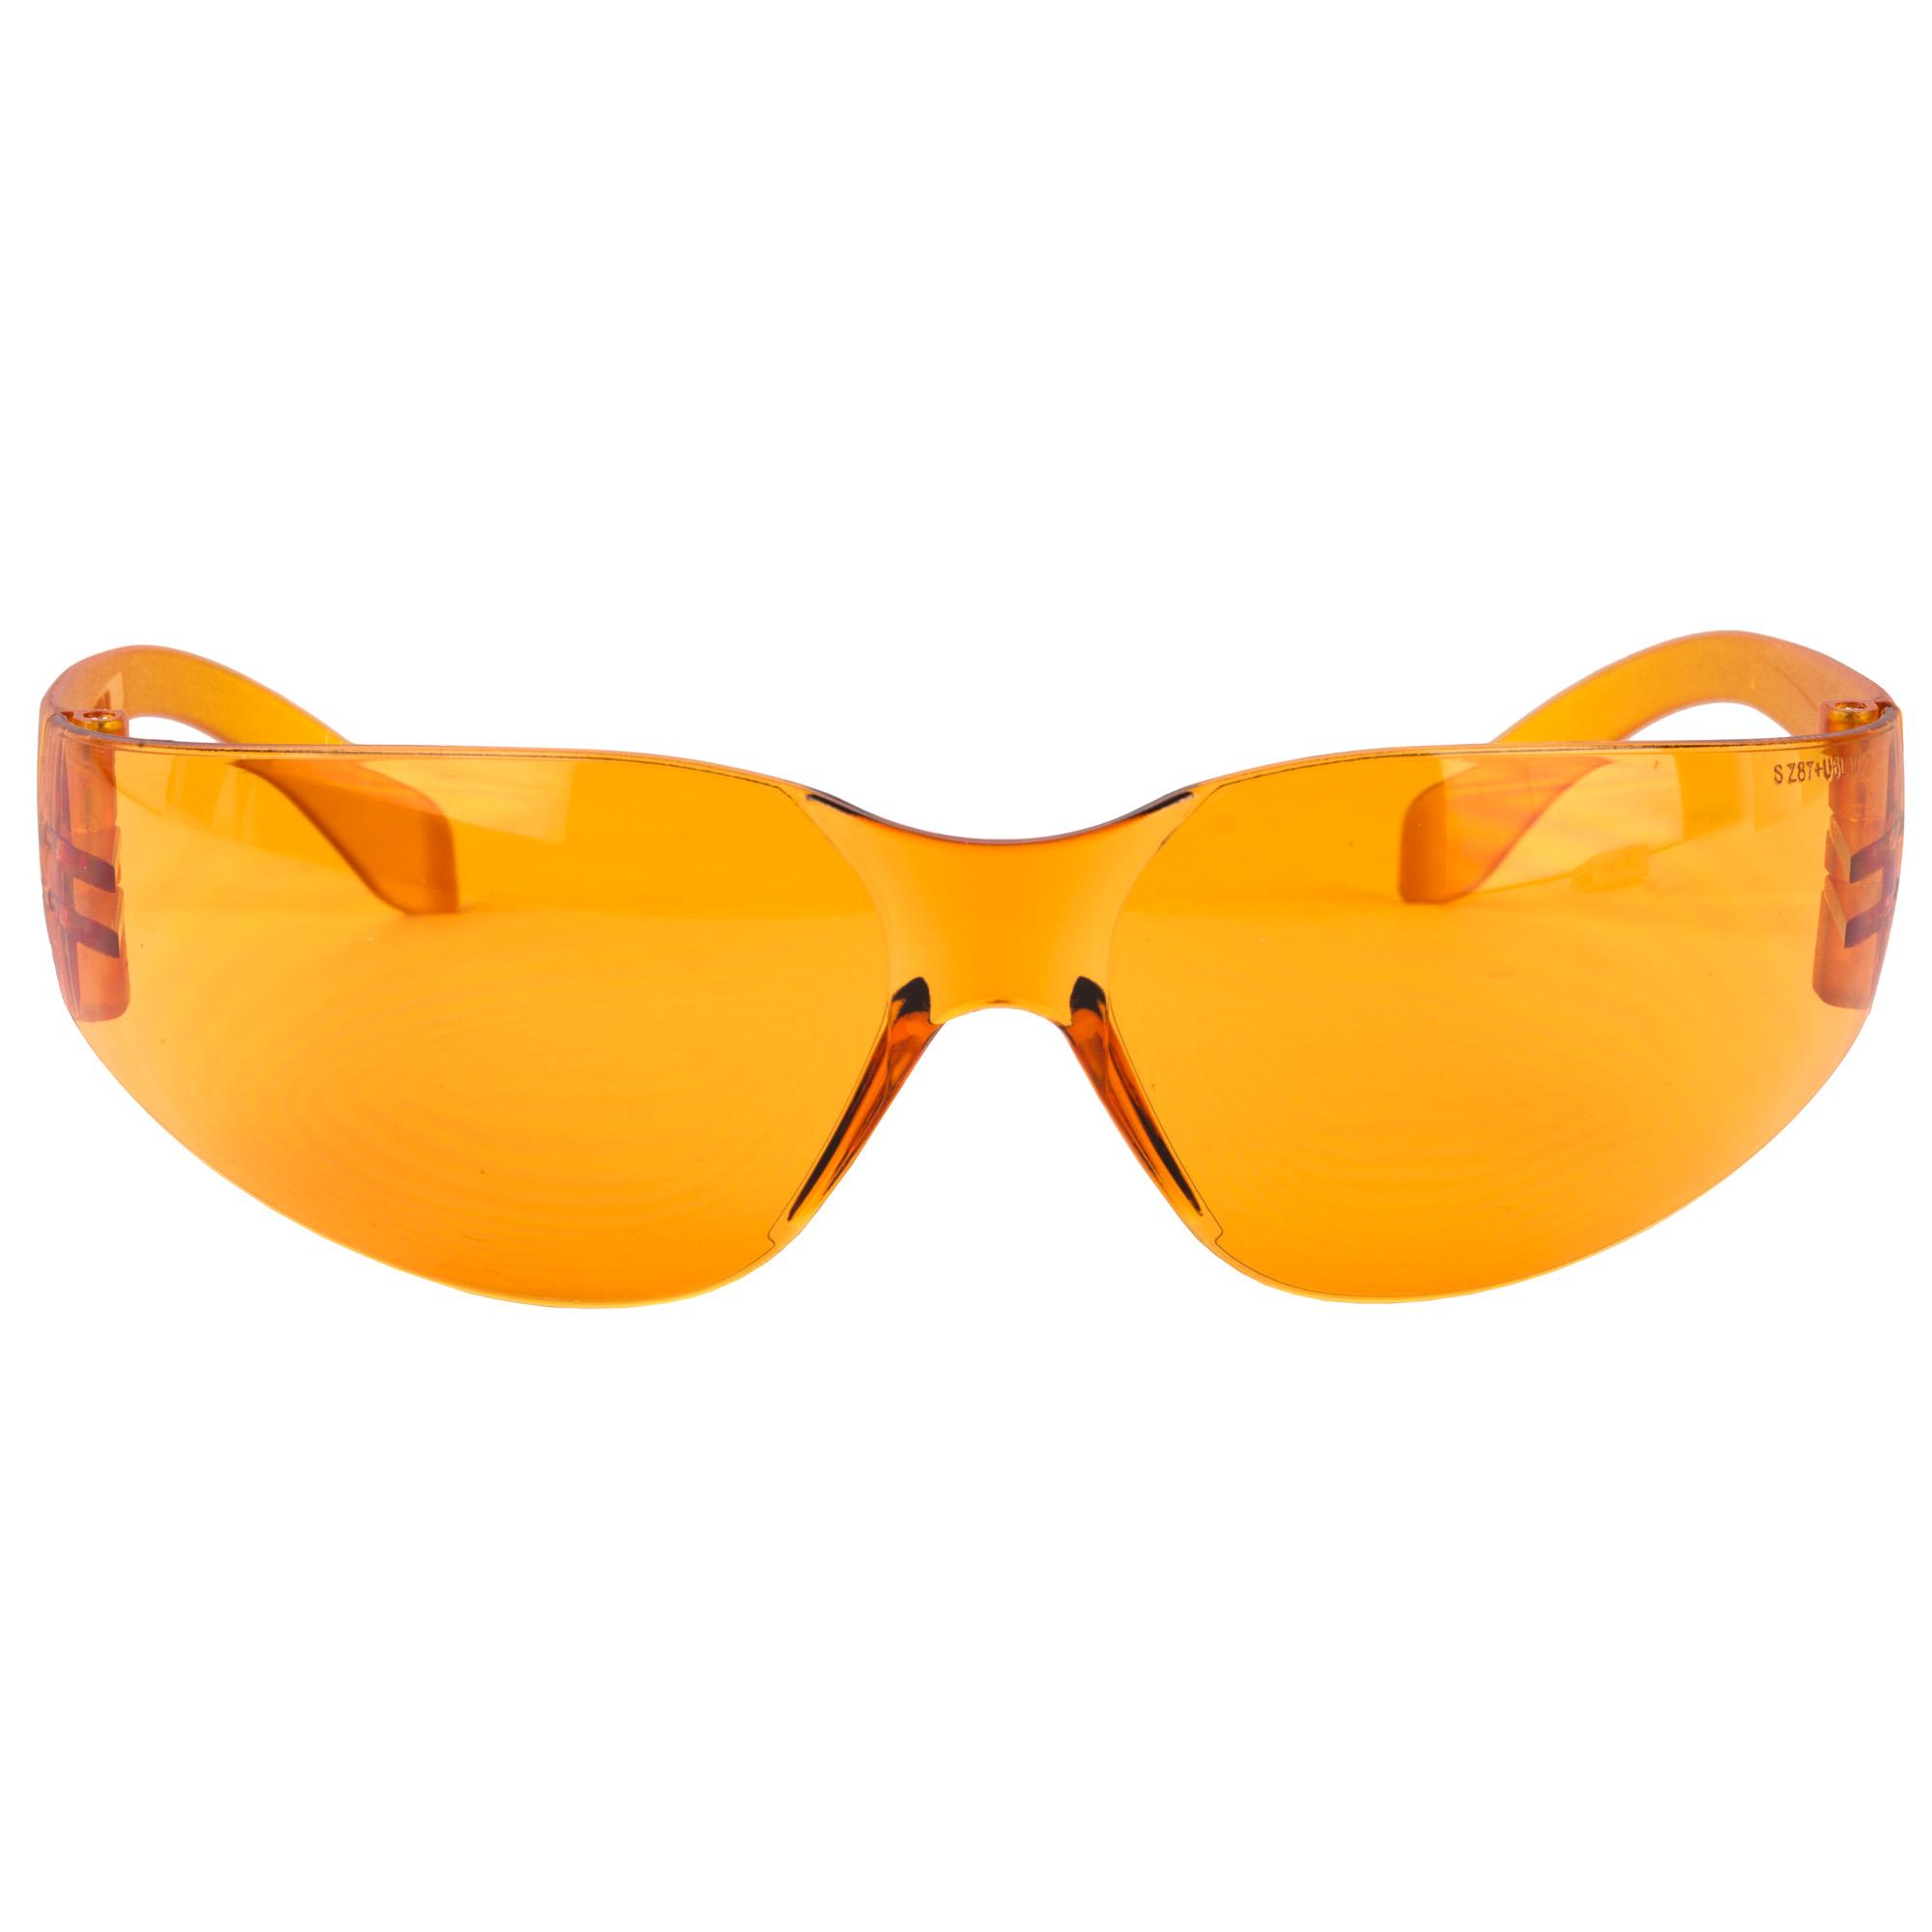 Walkers Wrap Sprt Glasses Ambr